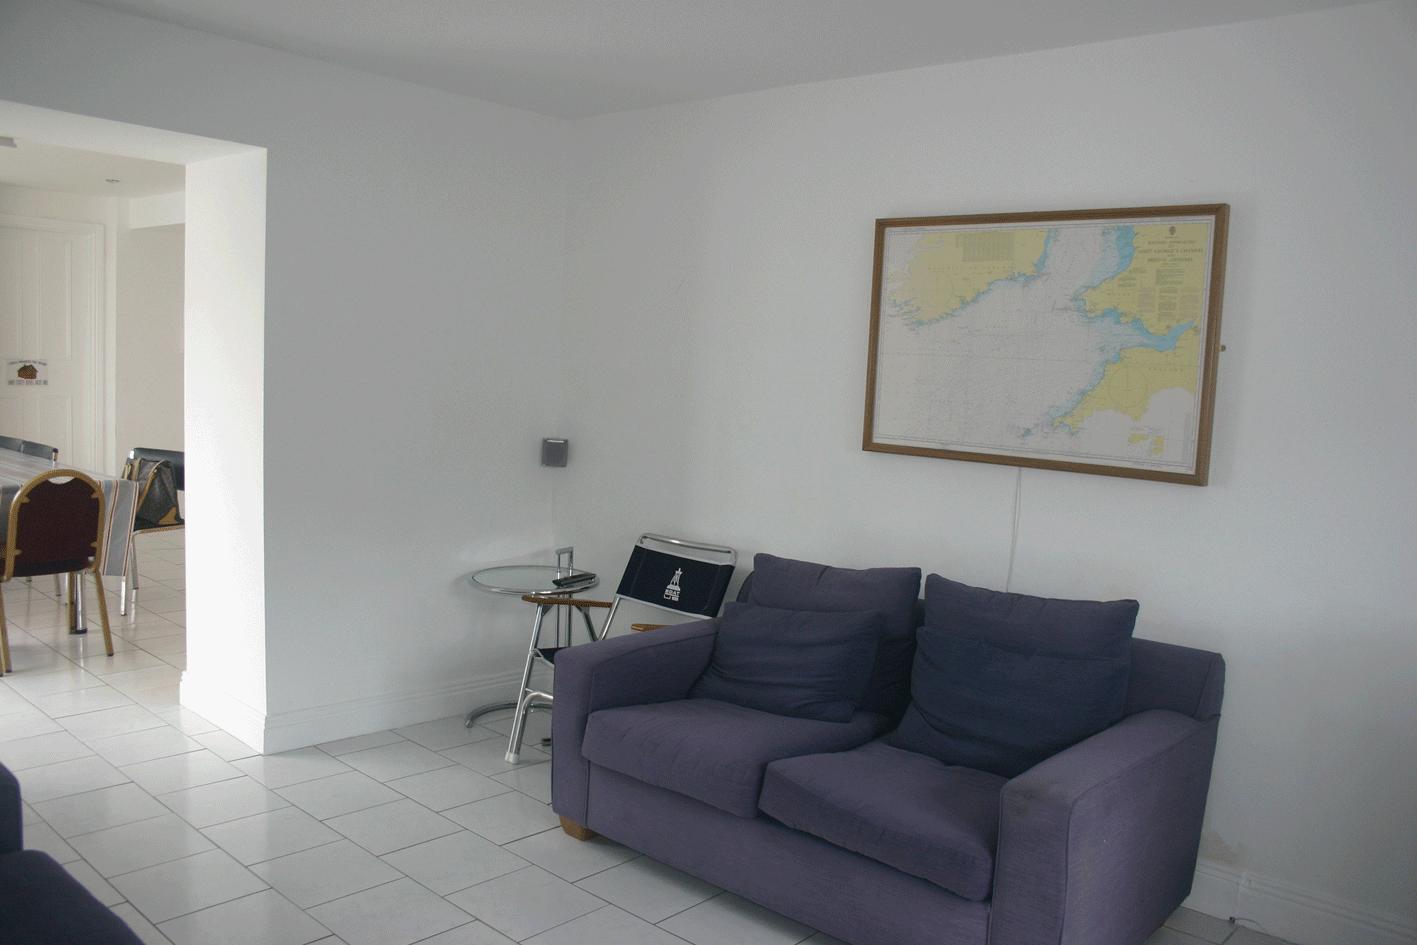 Dining room of Ecole De Mer accomodation